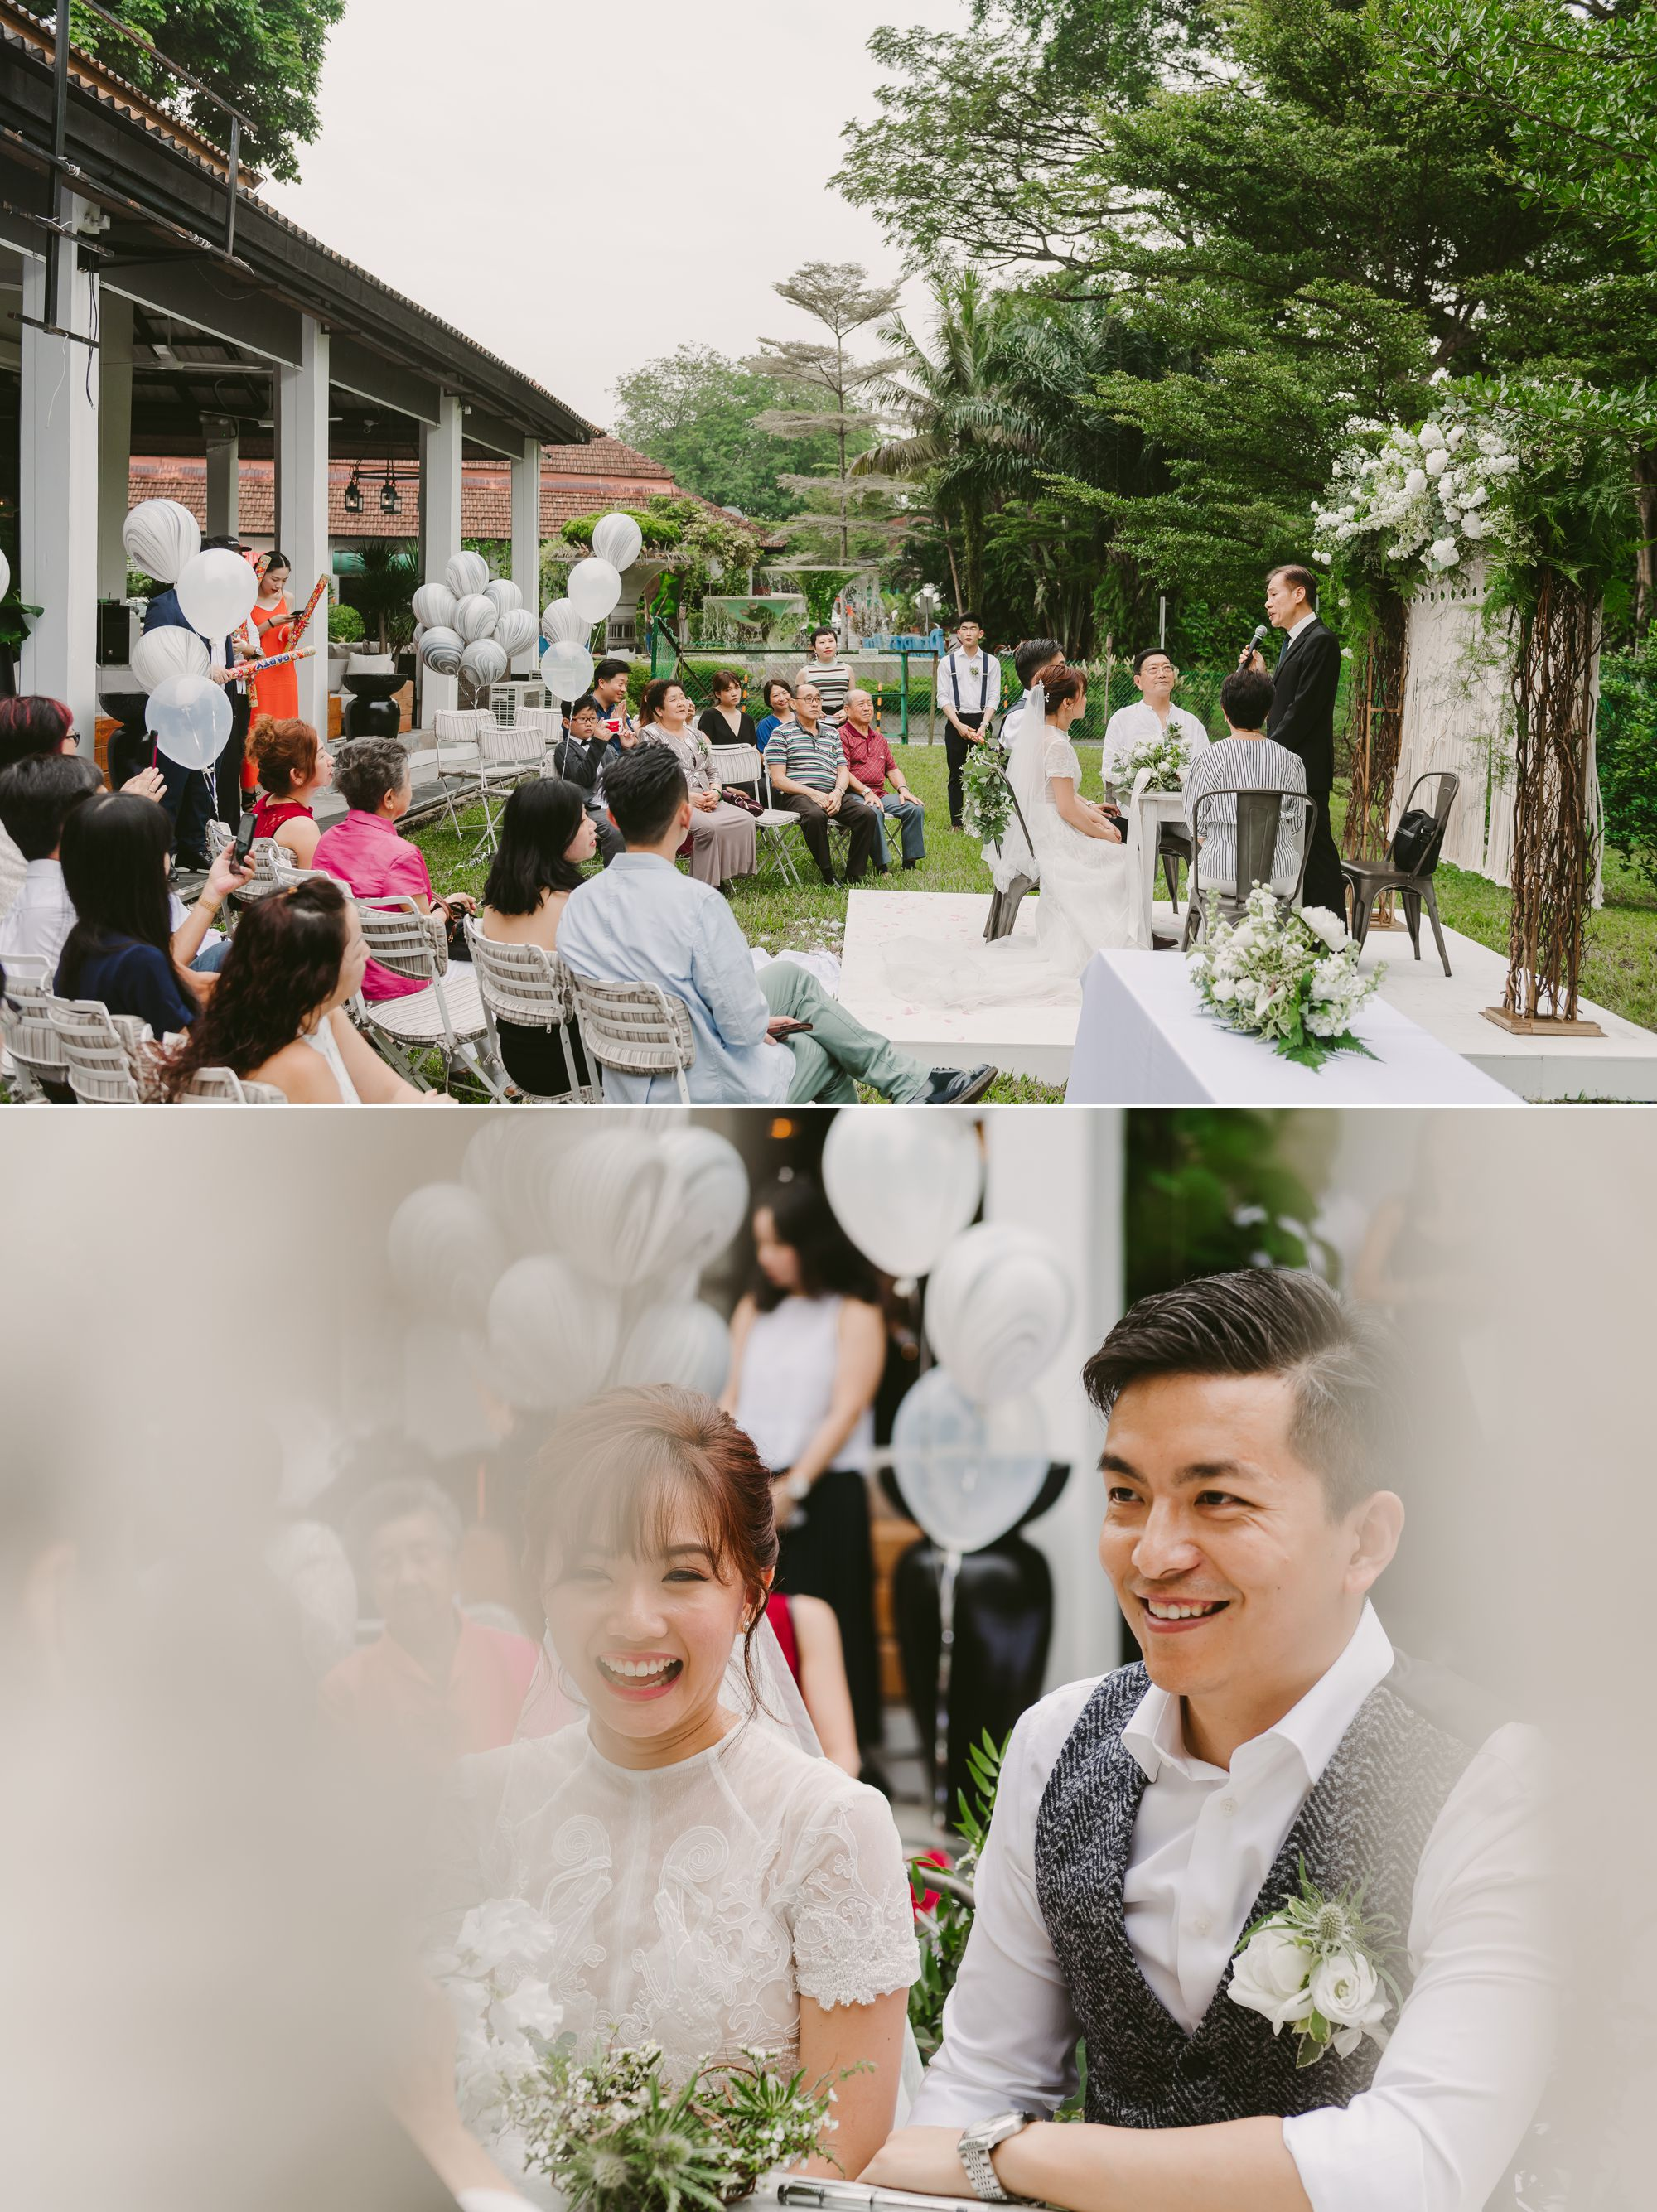 wedding_photography 16.jpg